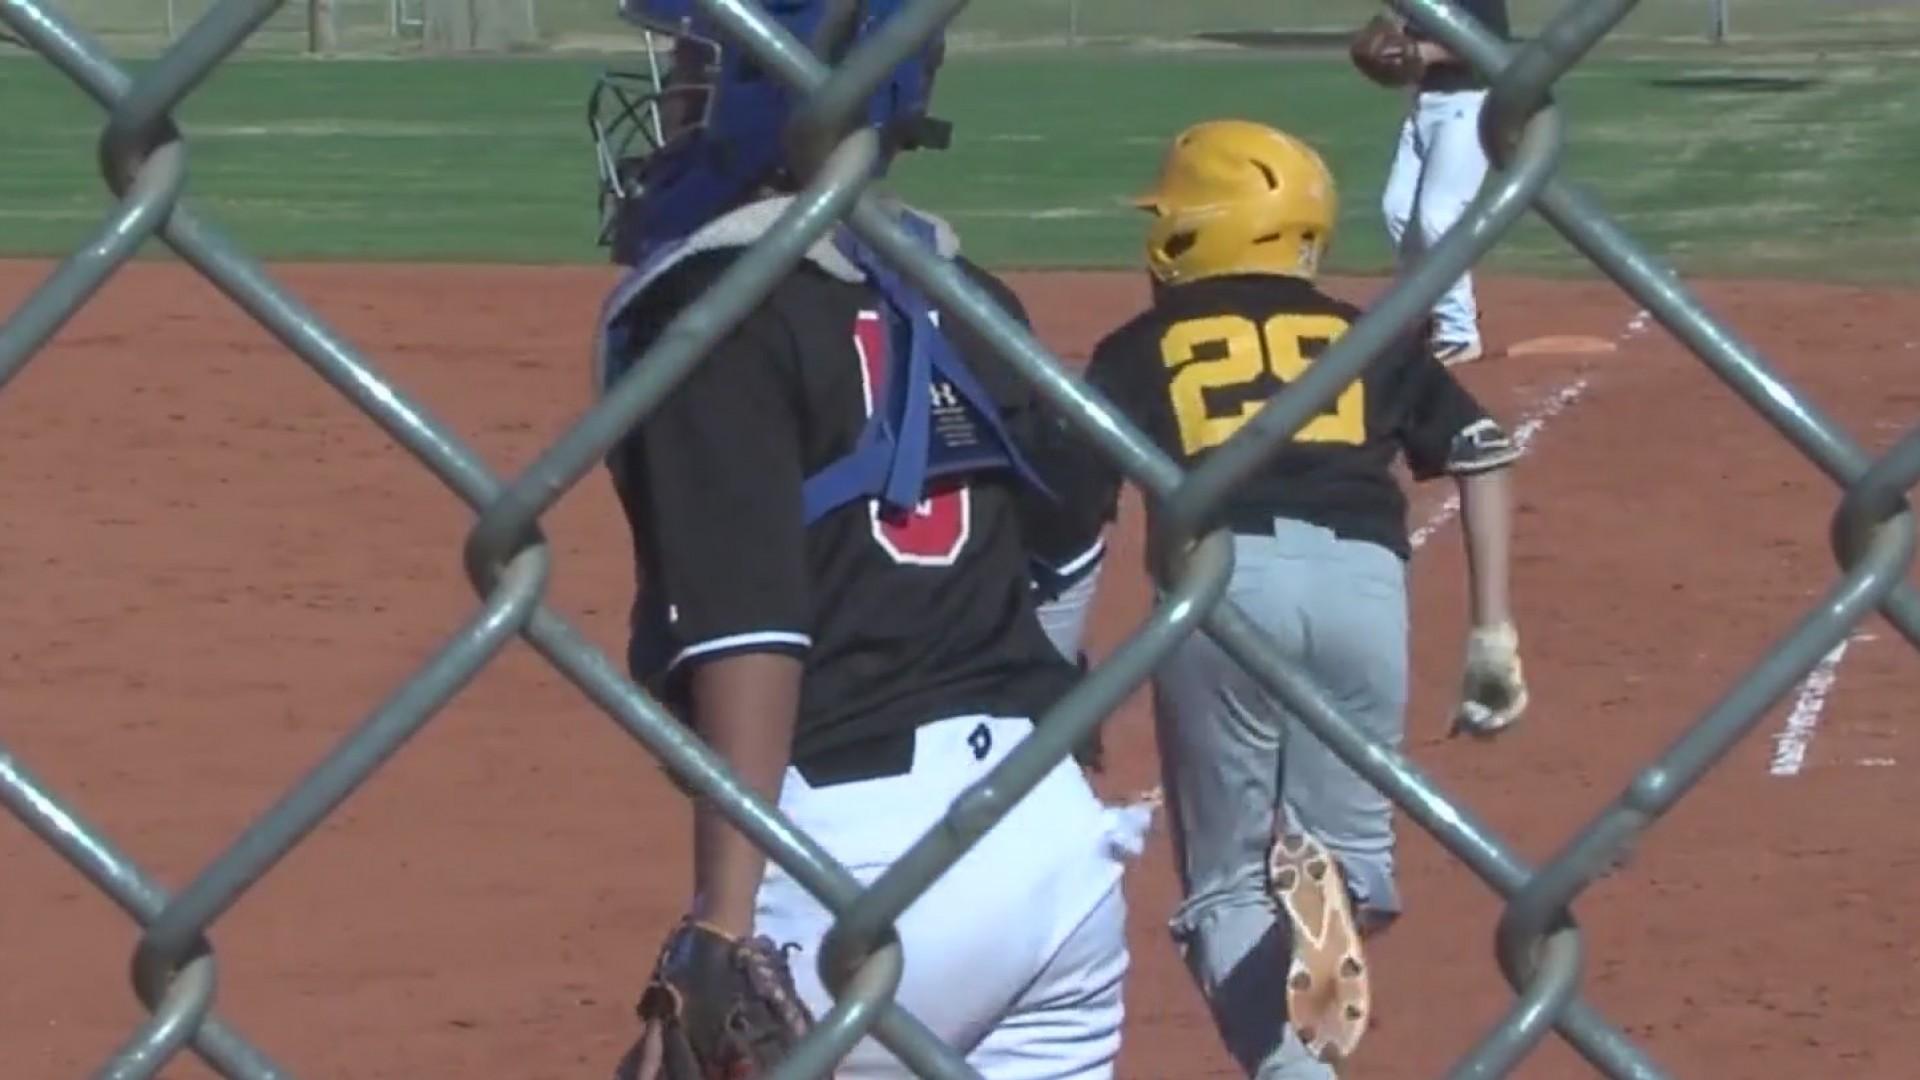 Rocky_Mountain_School_of_Baseball_Fall_E_0_20181027013444